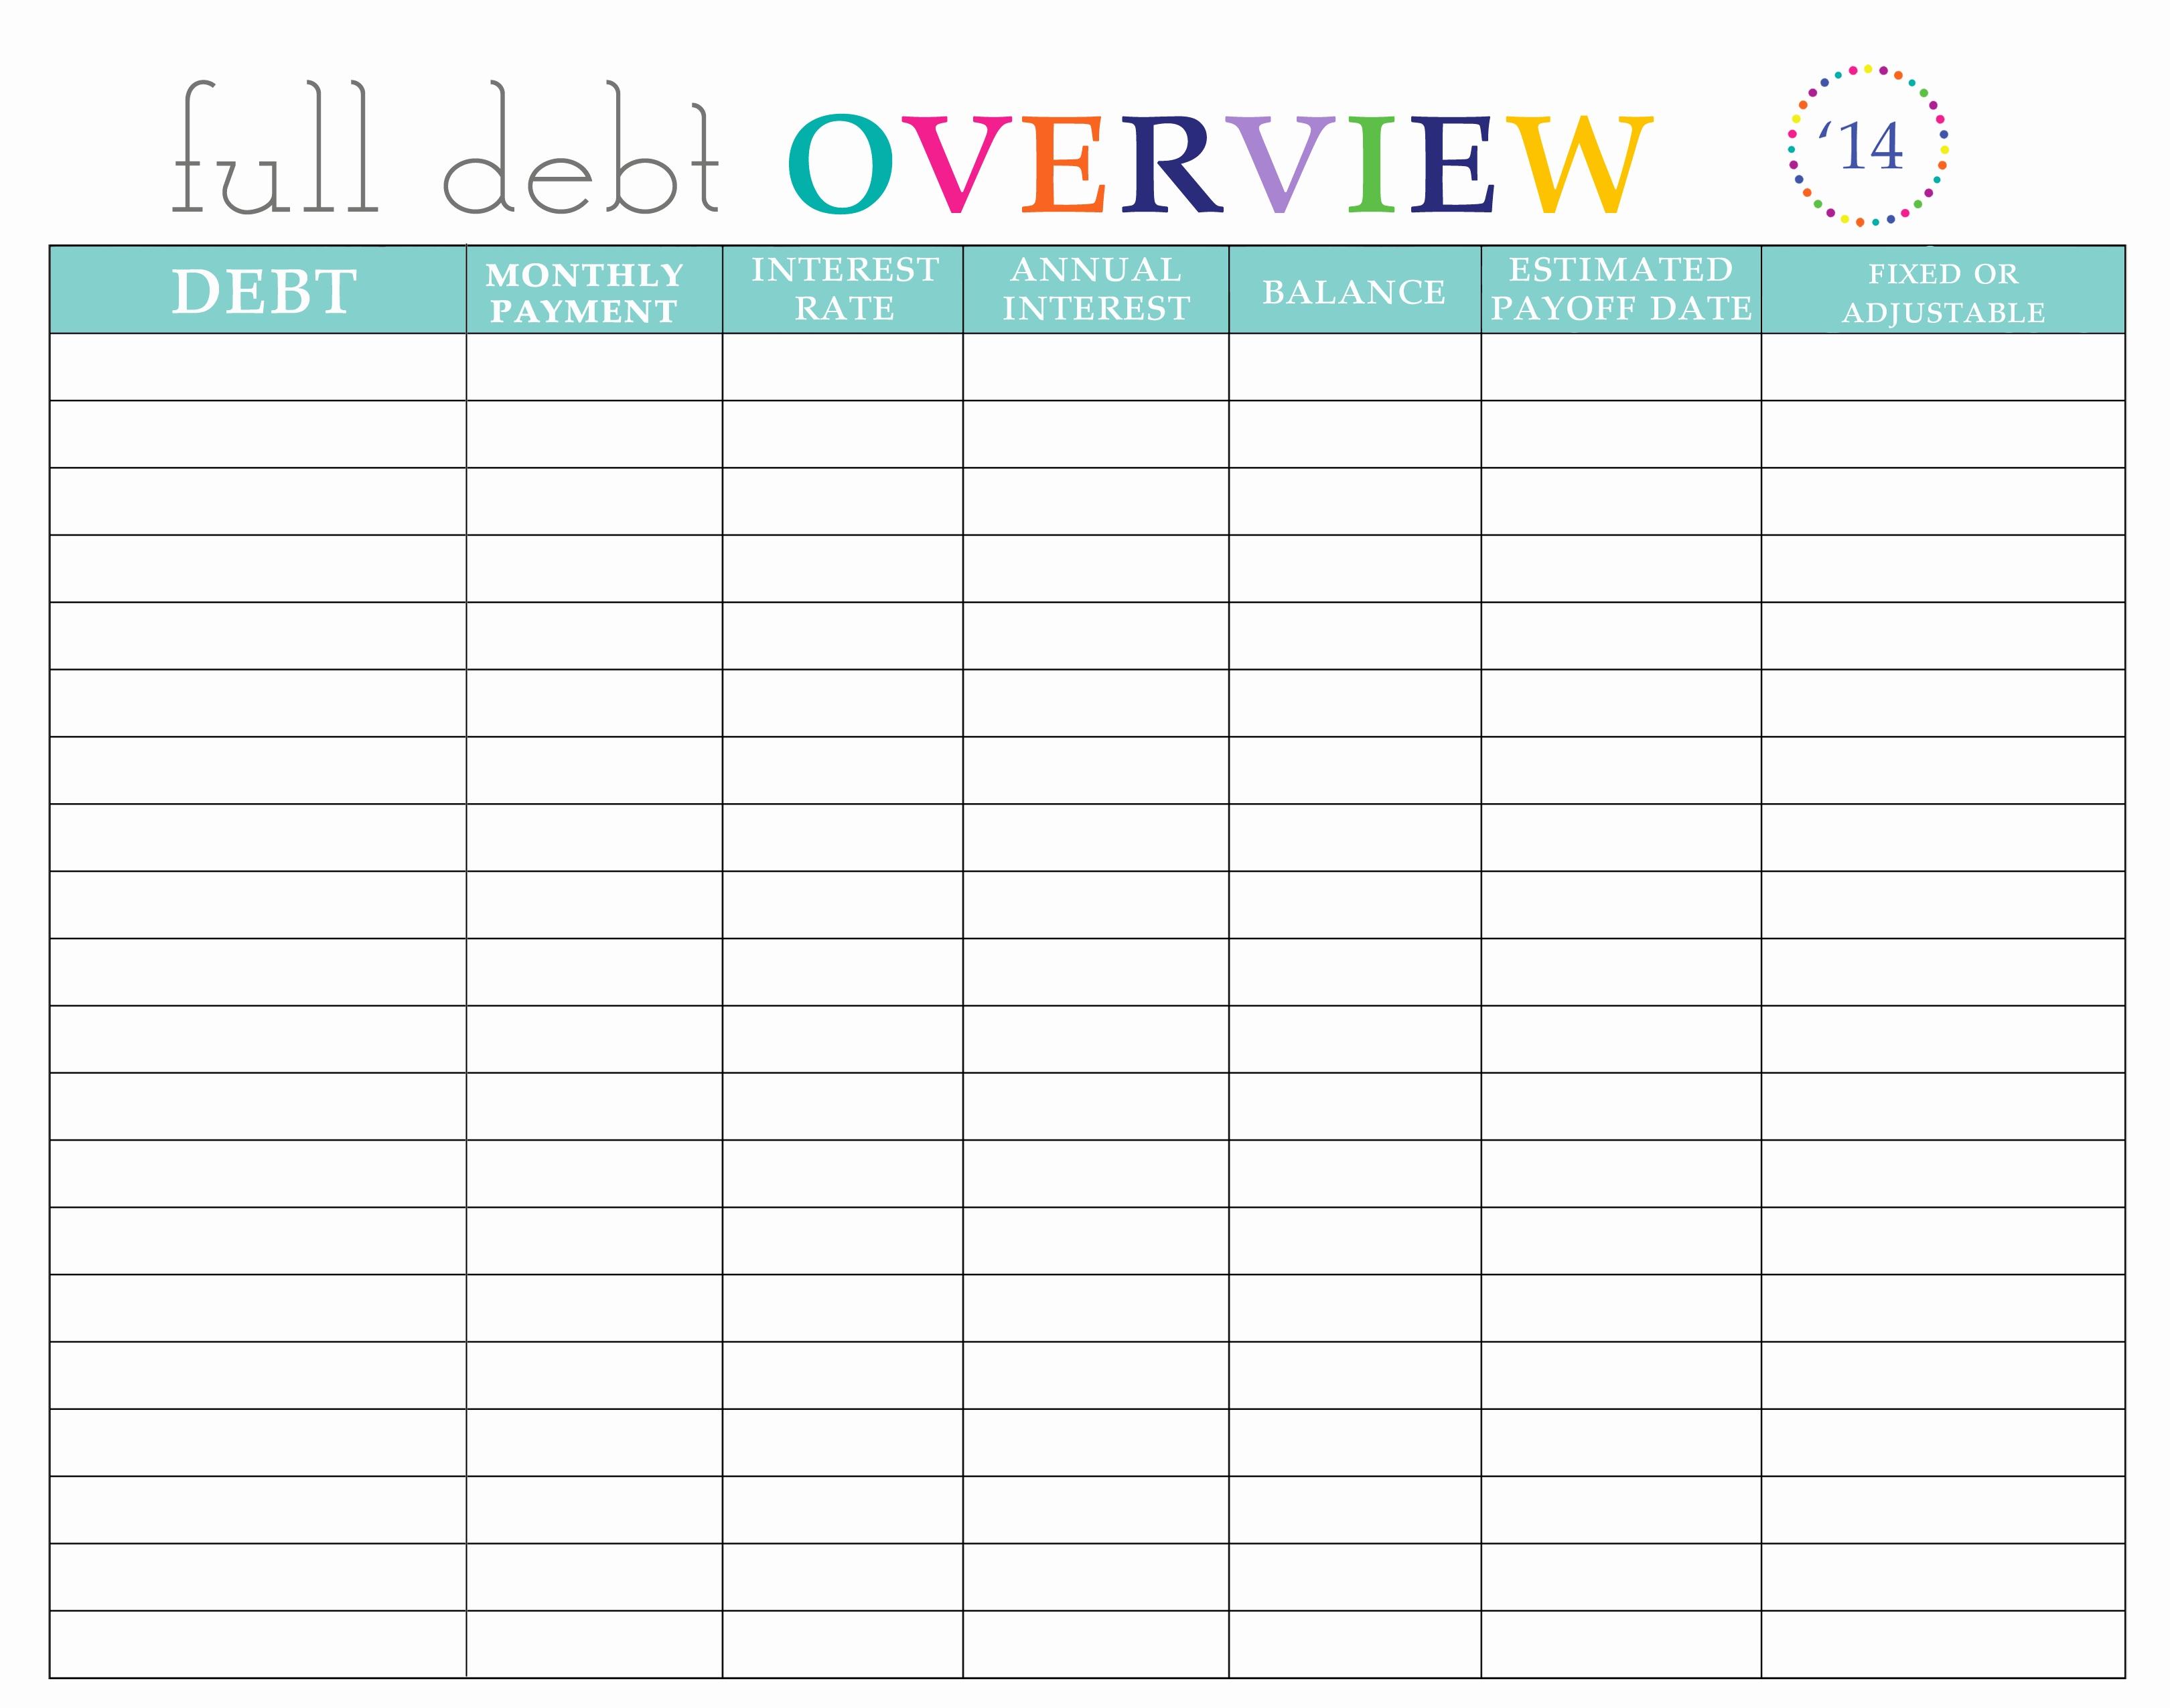 Debt Spreadsheet As Free Spreadsheet House Flipping Spreadsheet inside House Flipping Spreadsheet Free